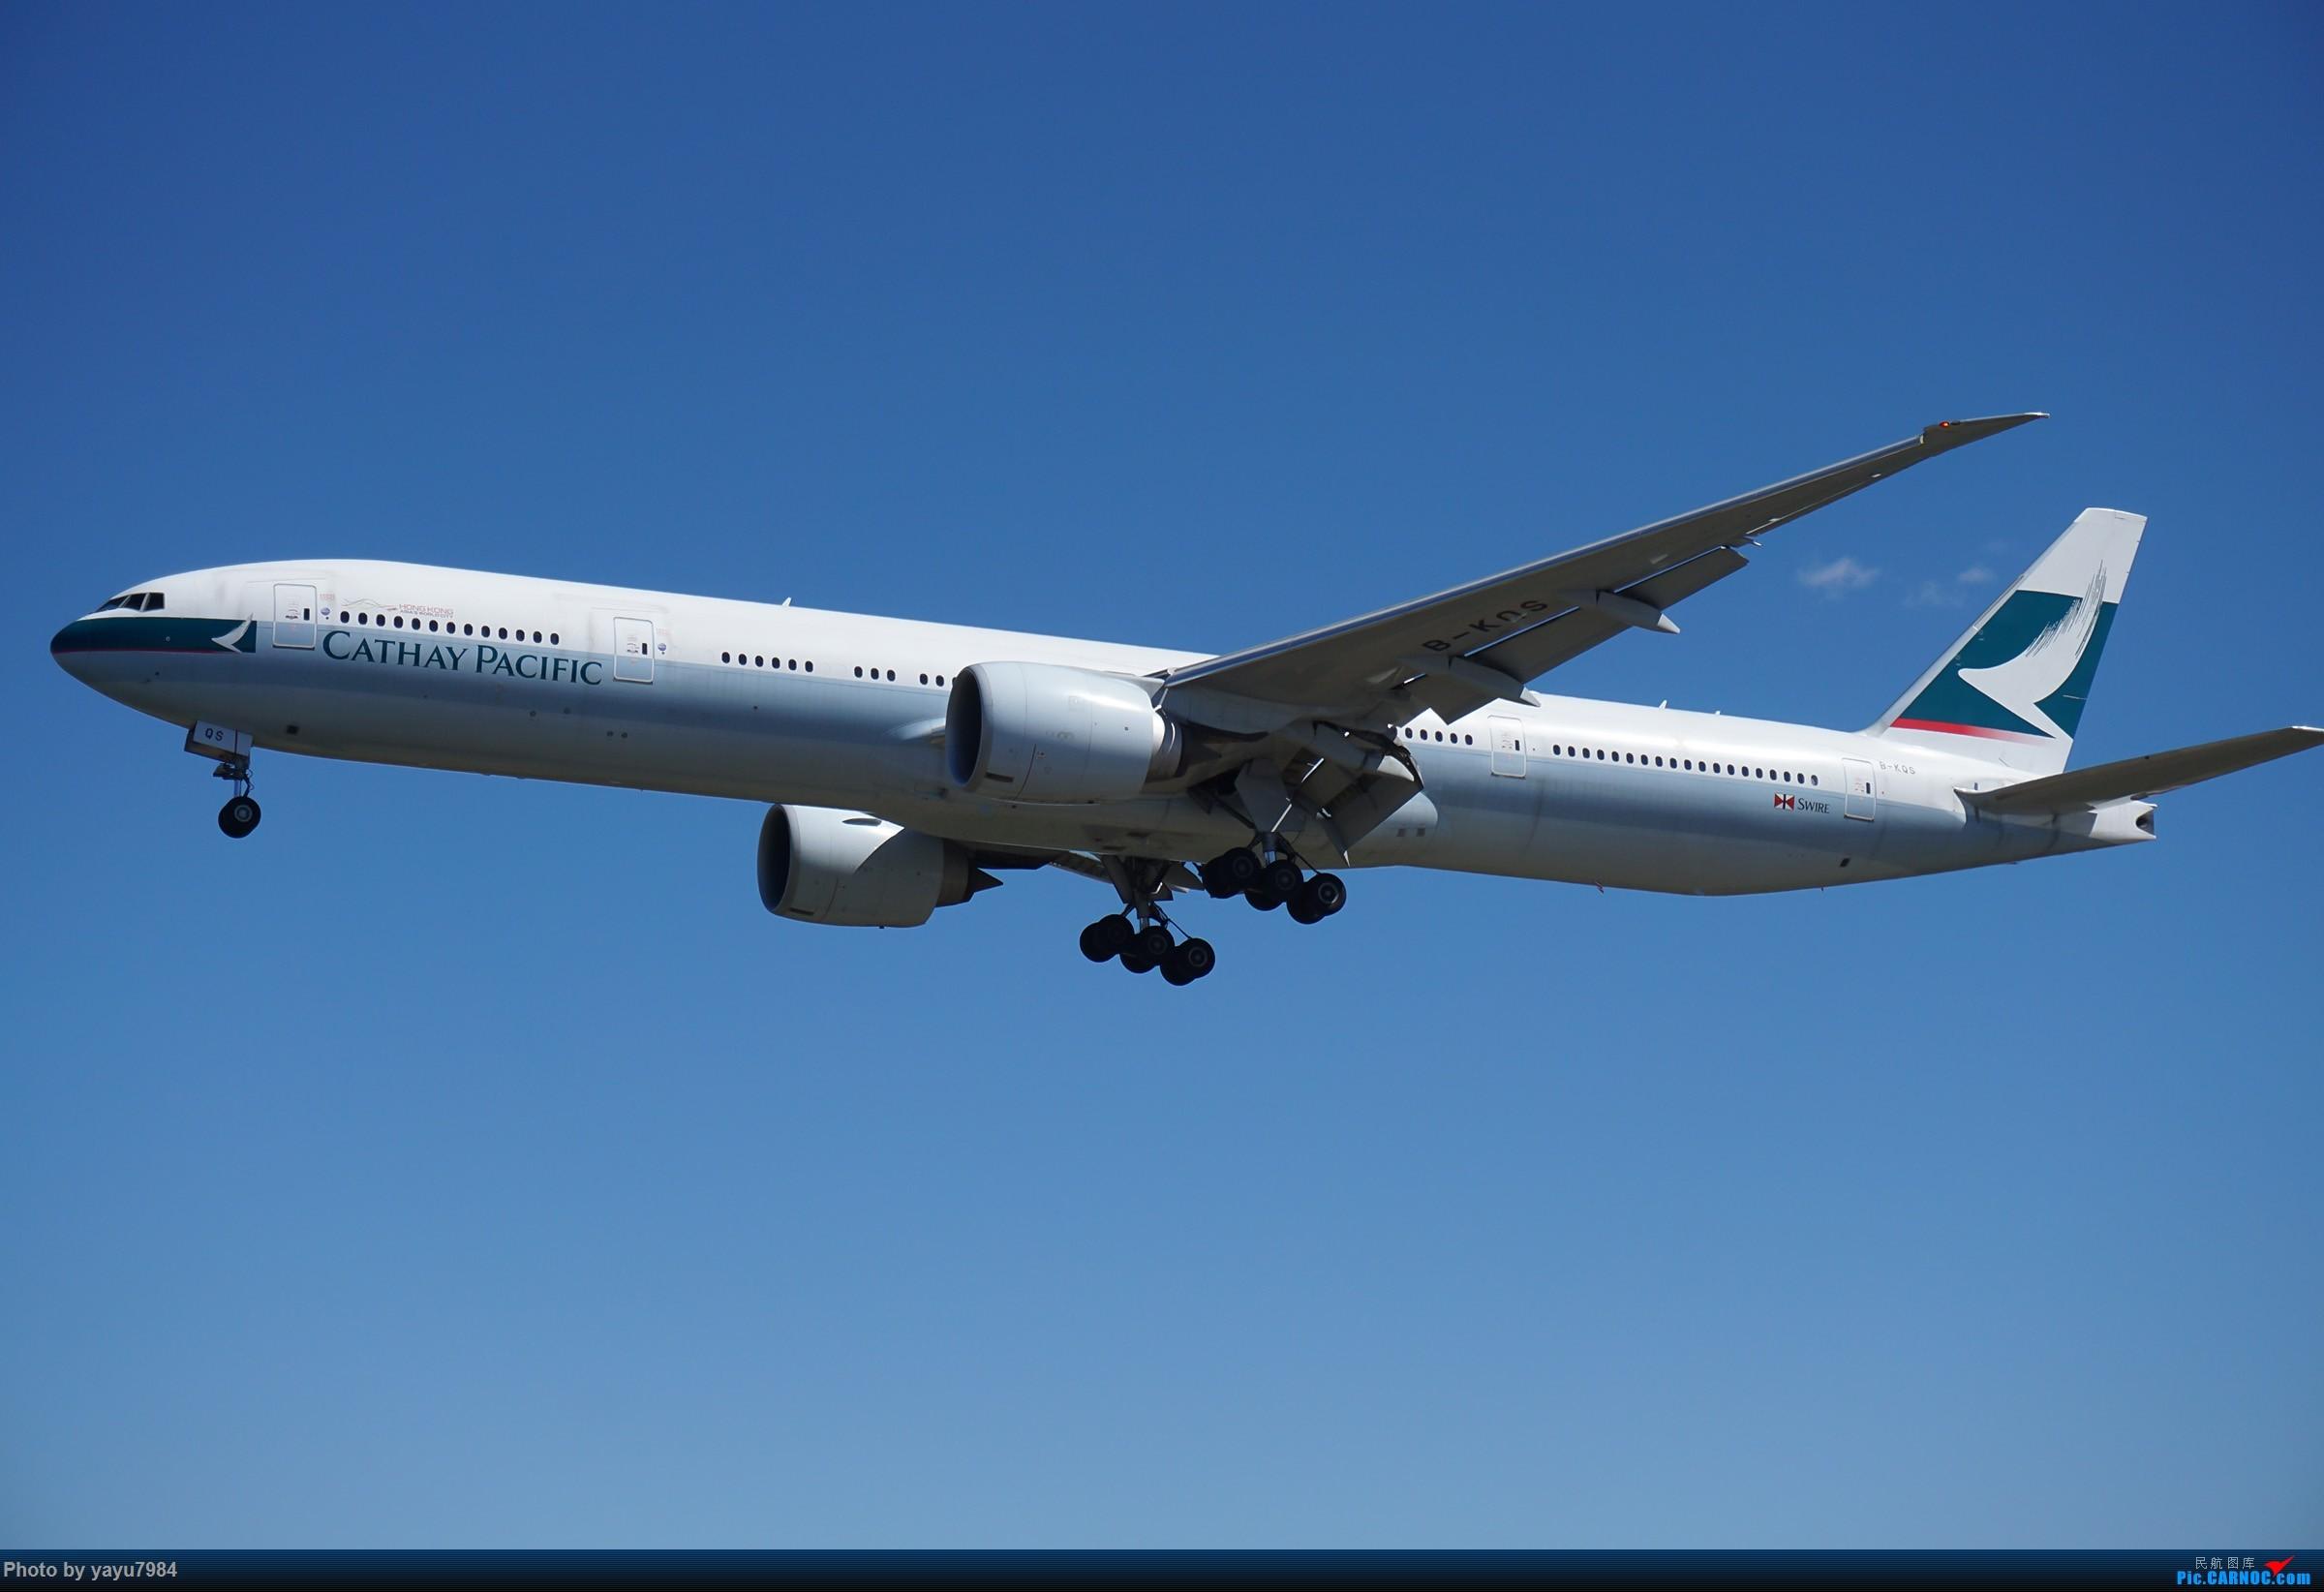 Re:[原创][SYD] 东航天合332,雪绒花343,华航蓝鹊,以及其他日常货 BOEING 777-300ER B-KQS 澳大利亚悉尼金斯福德·史密斯机场